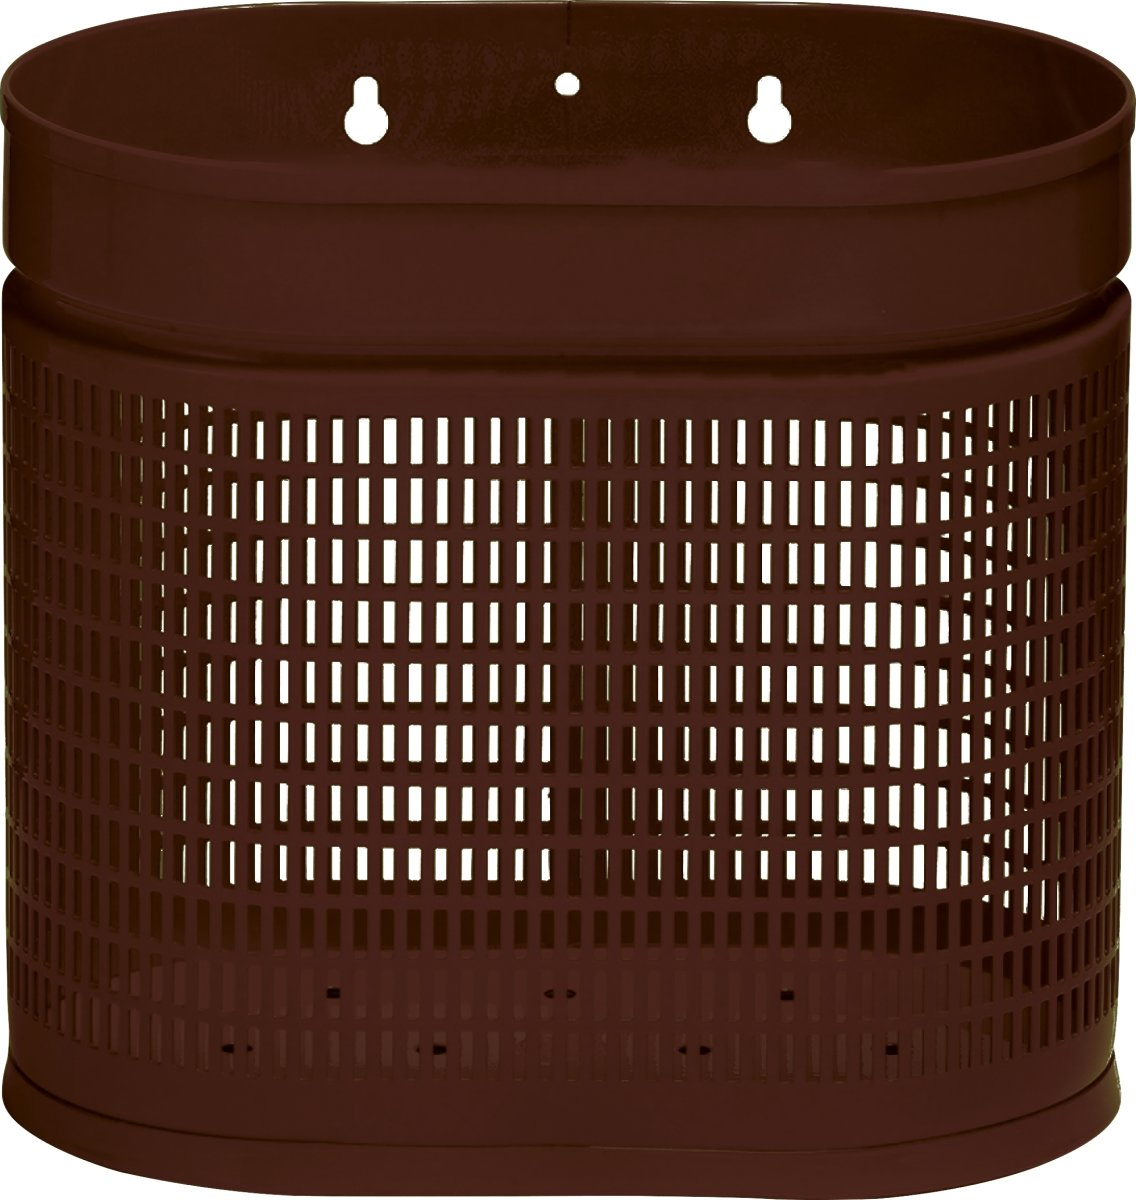 RMIG affaldsspand type 544U, brun